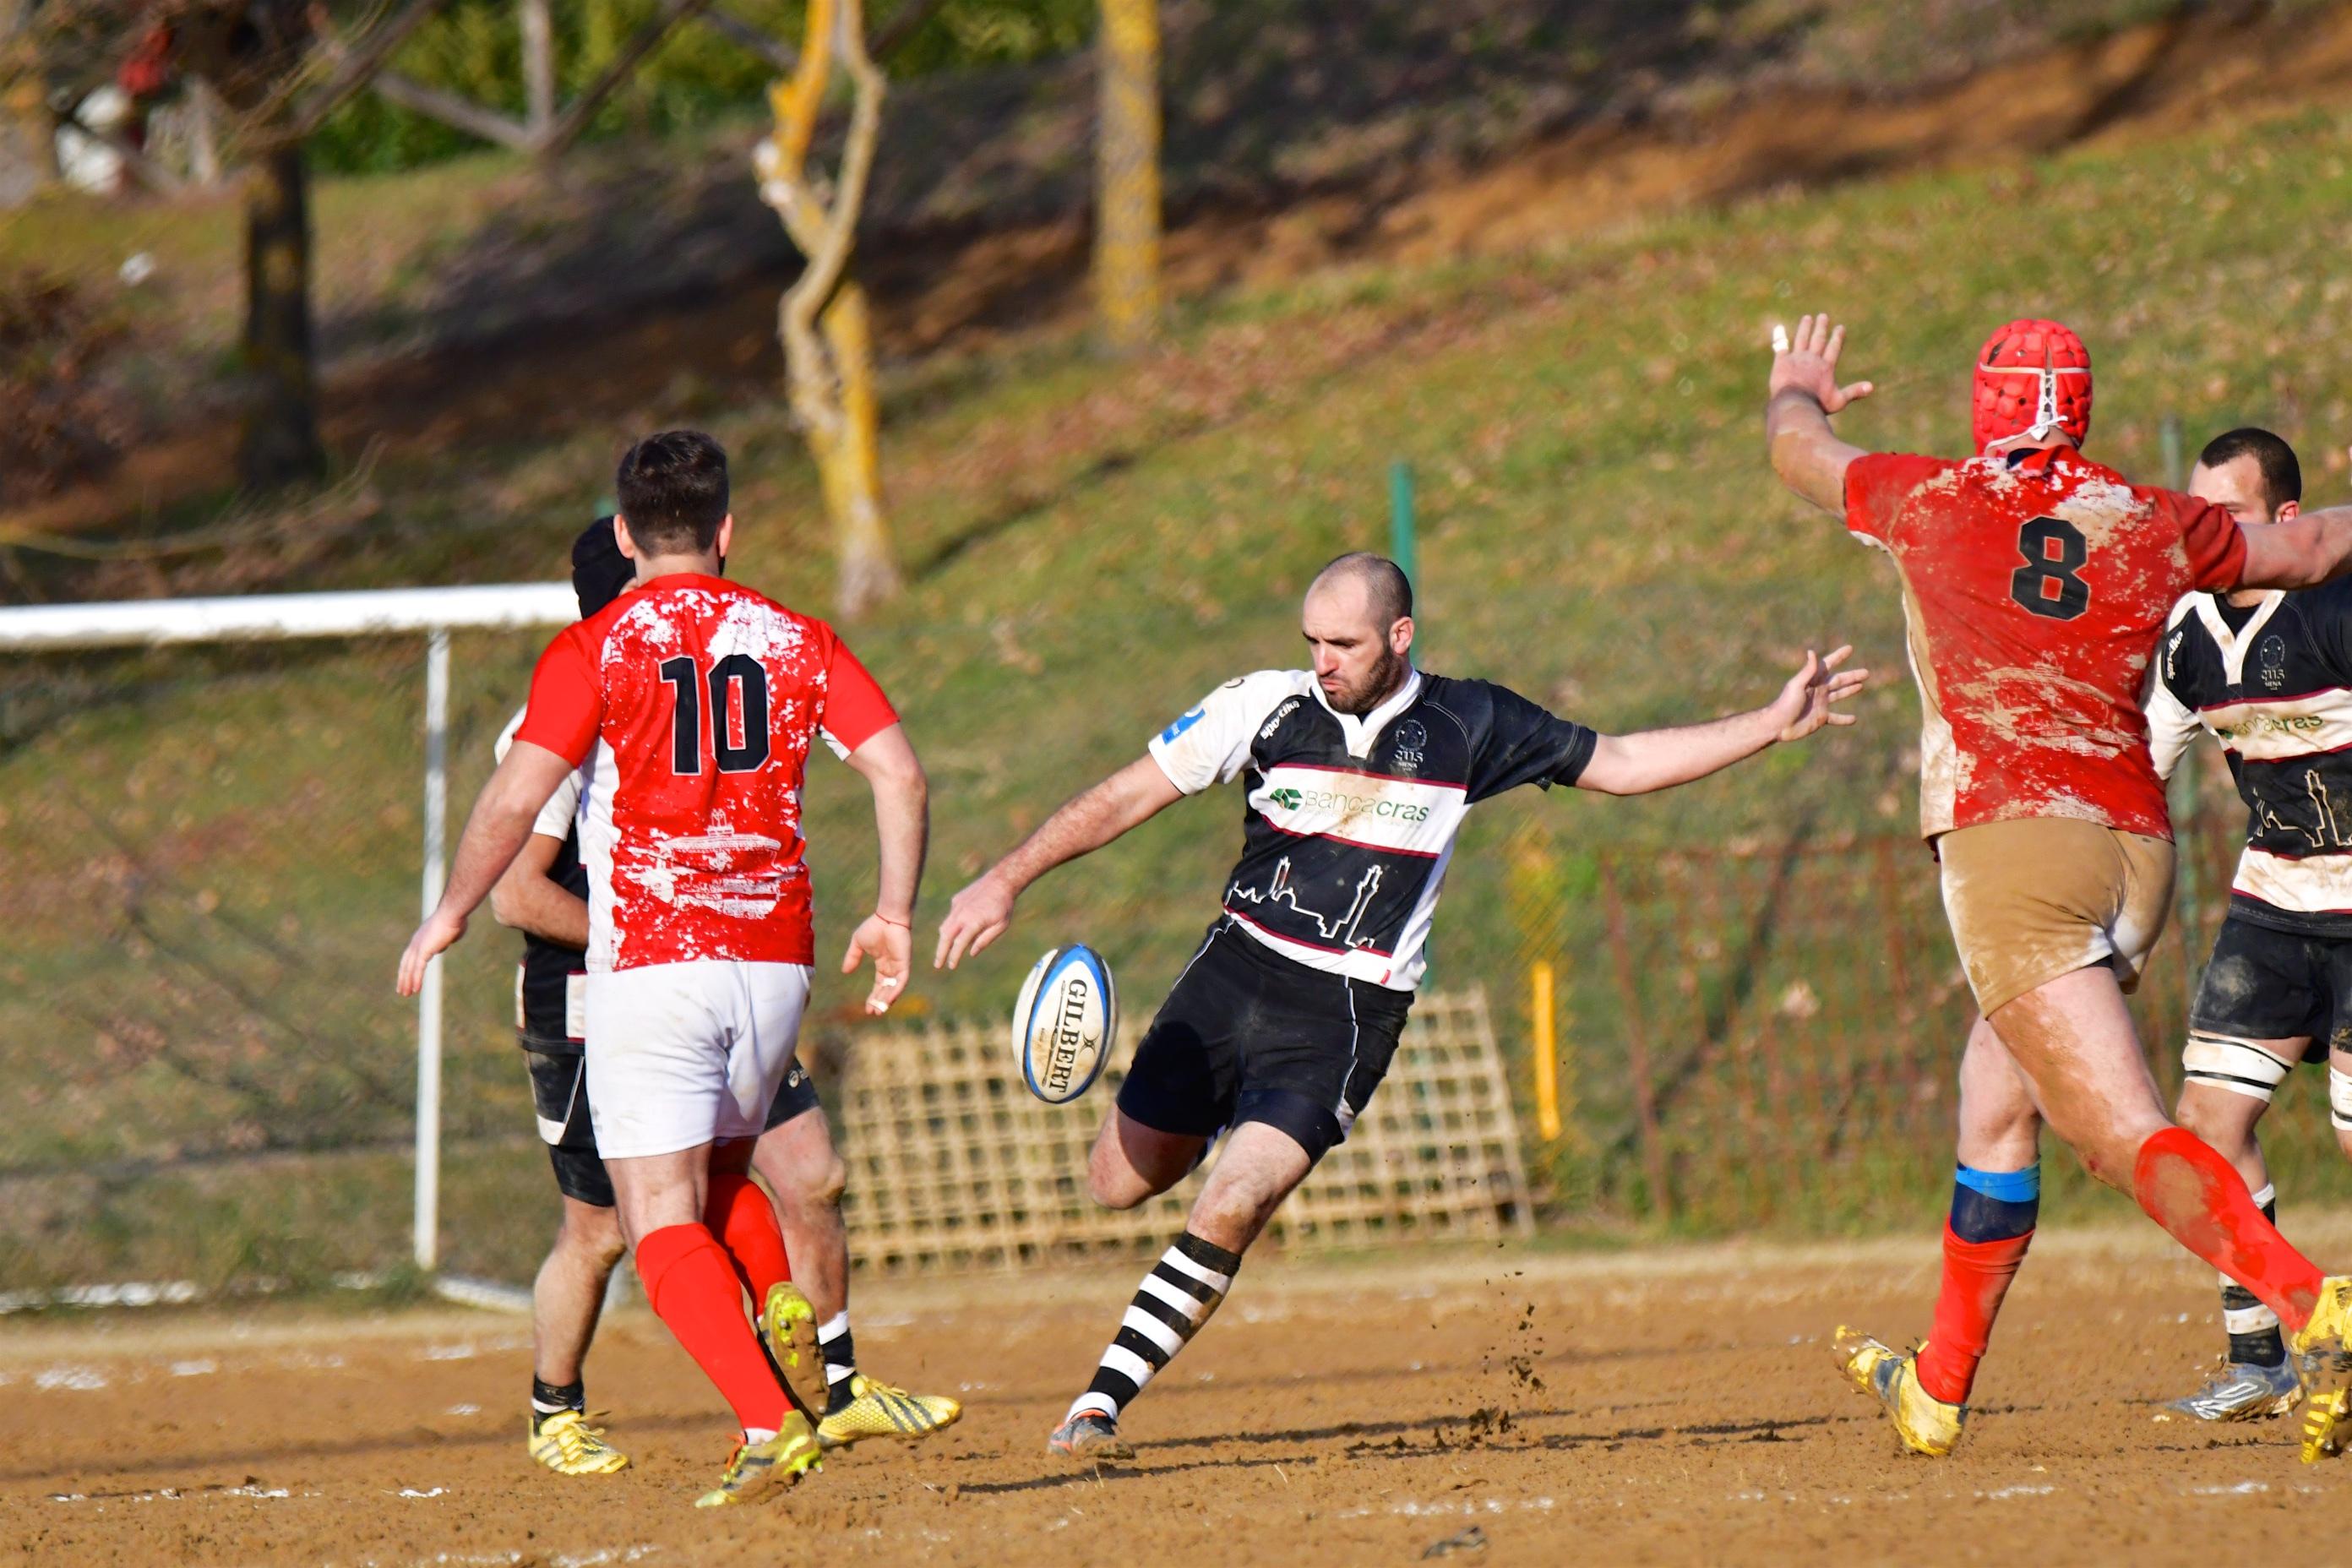 Banca CRAS CUS Siena sconfitto dal Civitavecchia Rugby